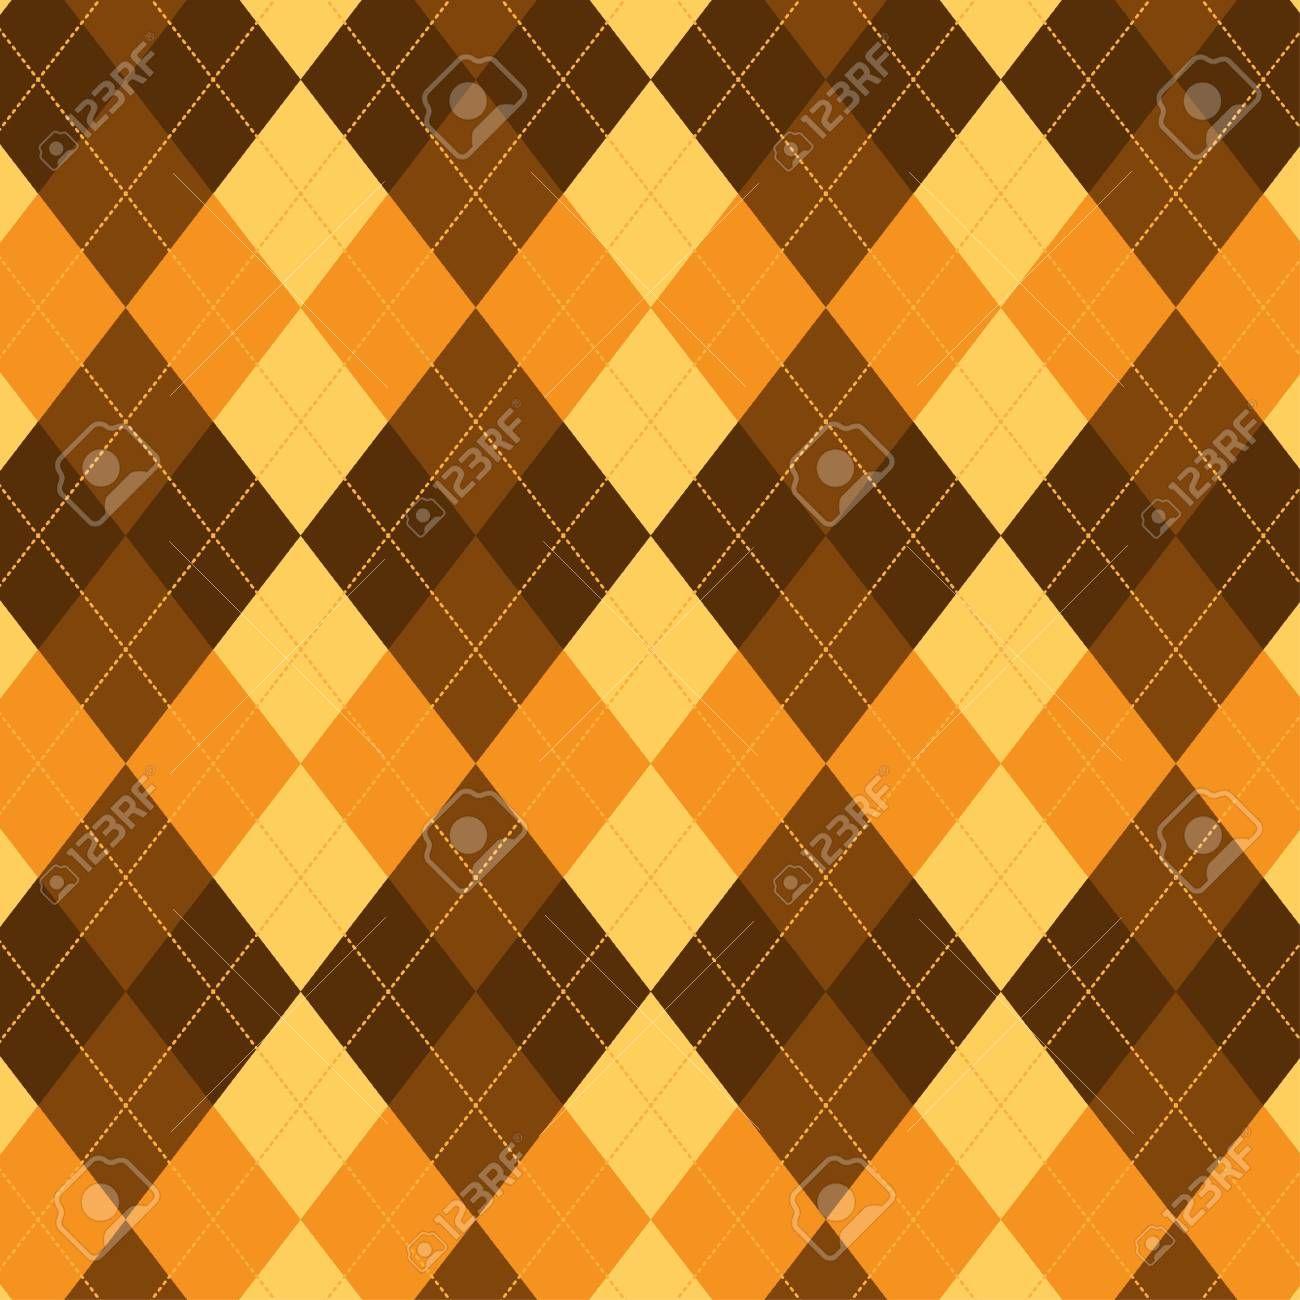 Seamless argyle pattern. Diamond shapes background. , AD